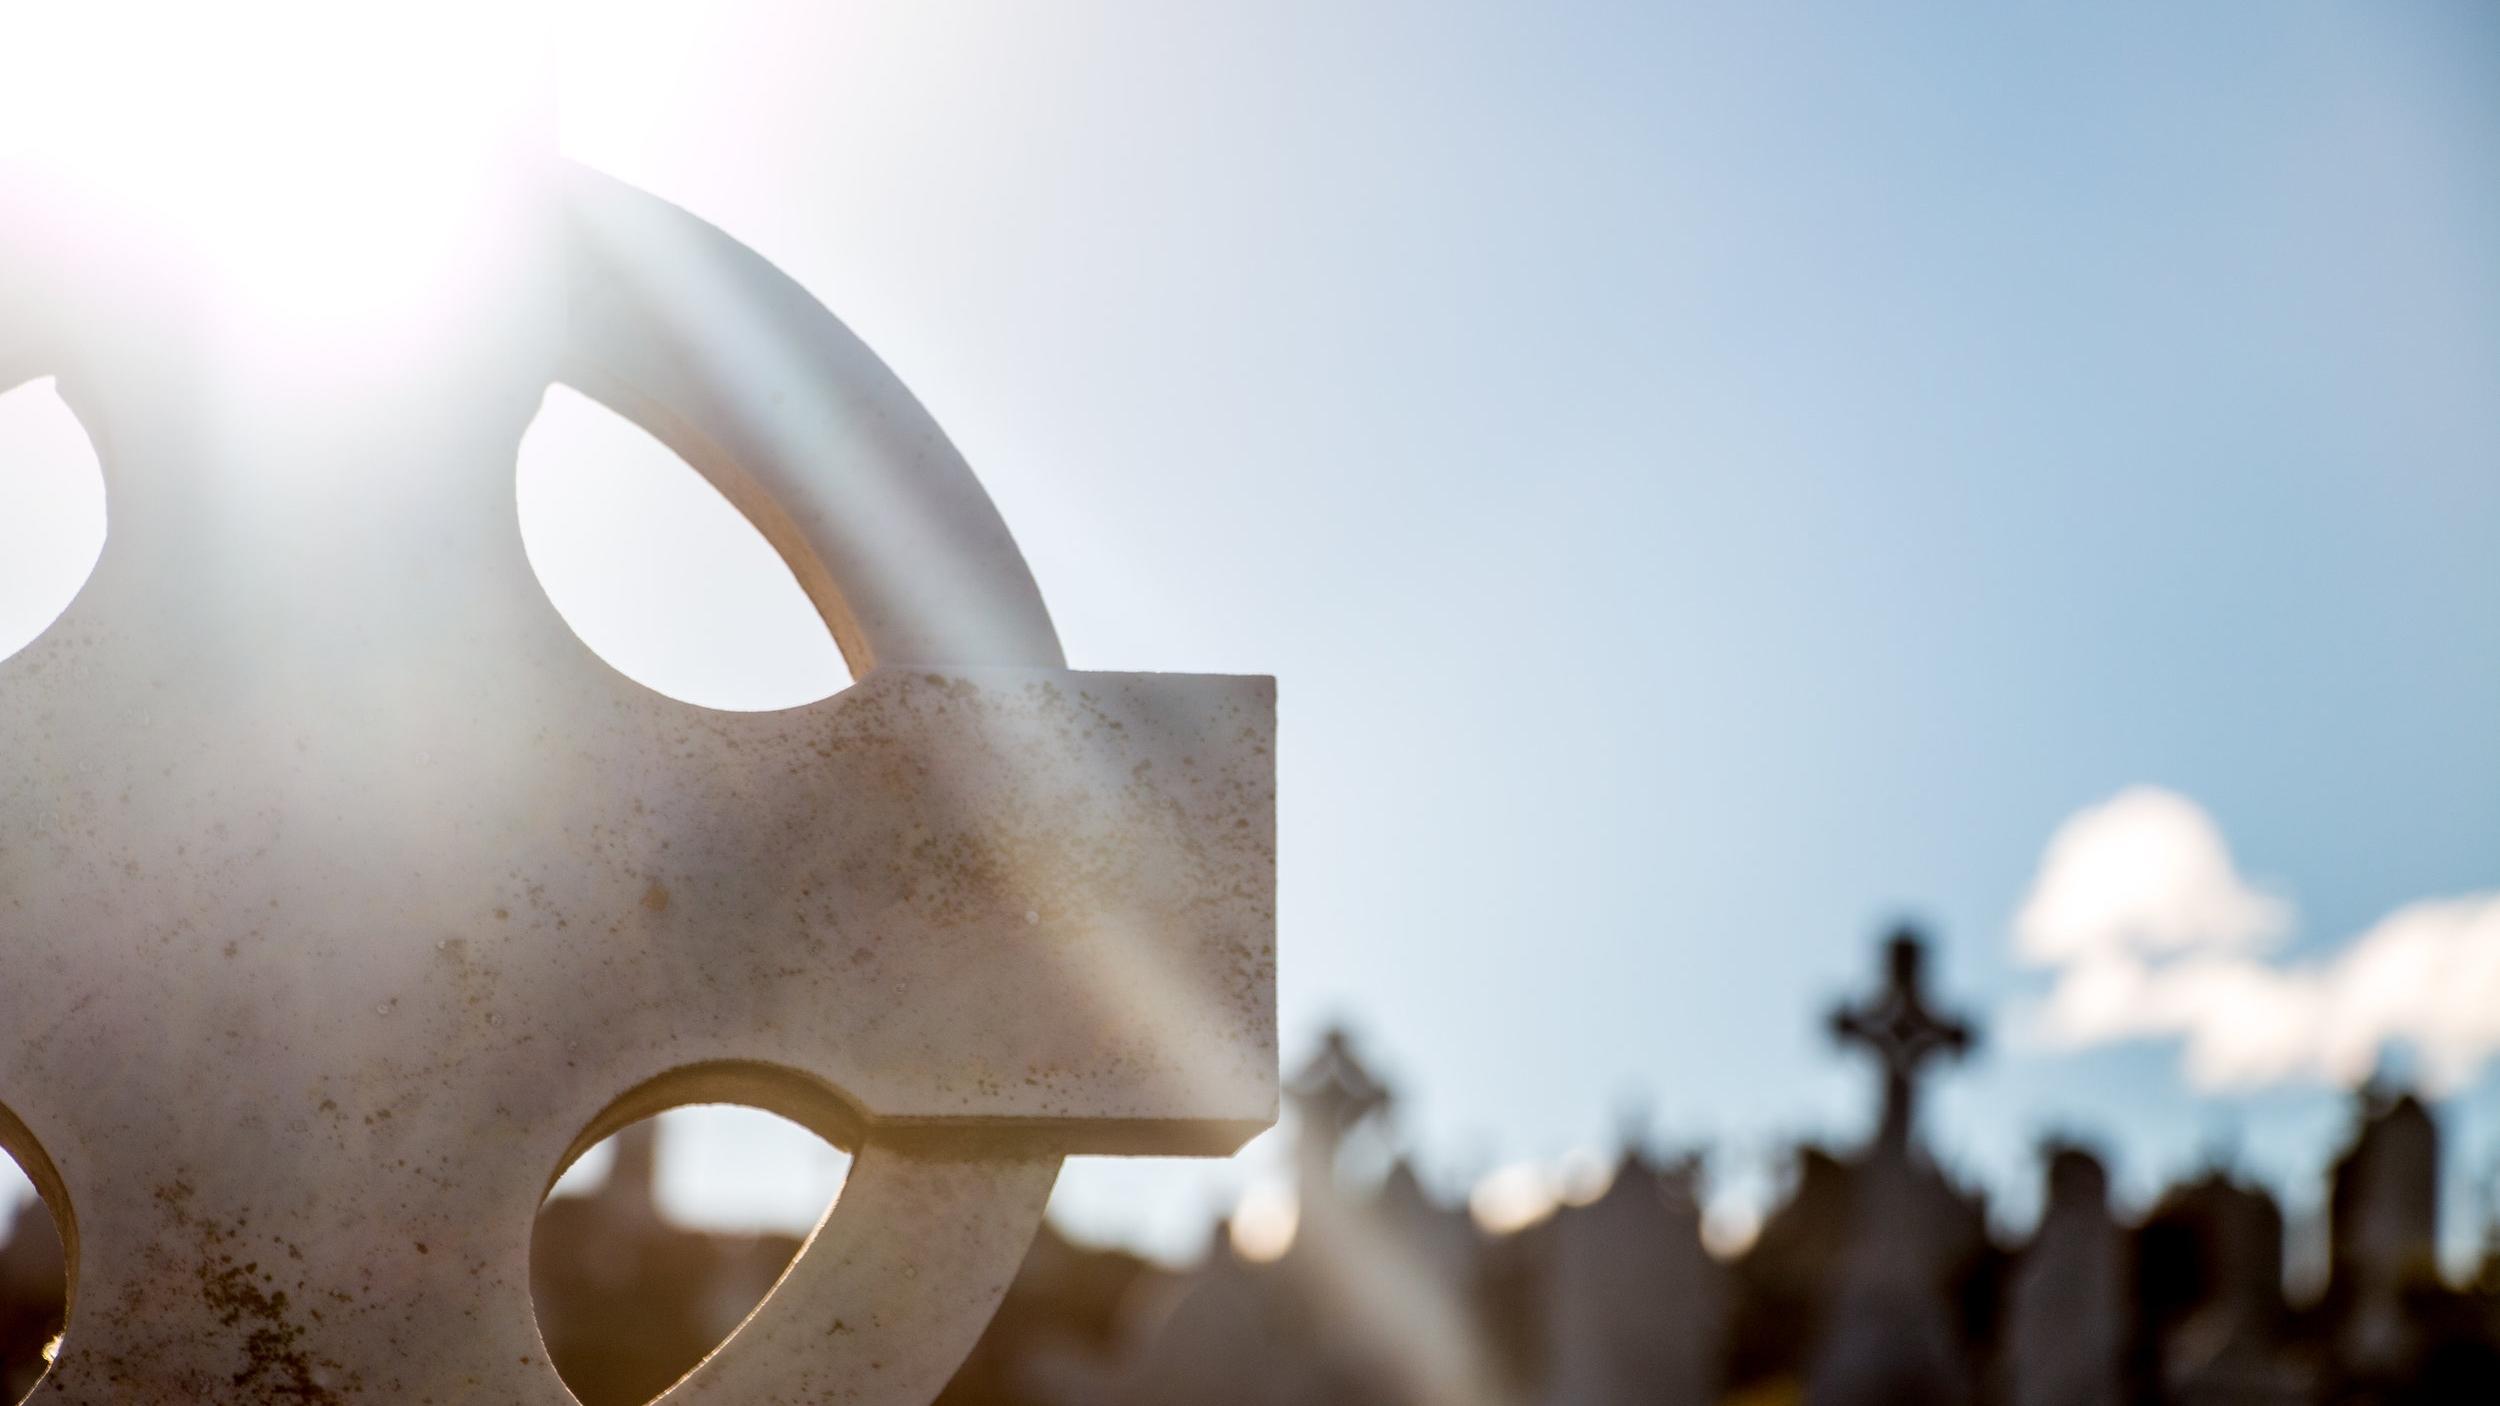 Death & BECOMING HUMAN - Fr. John Behr